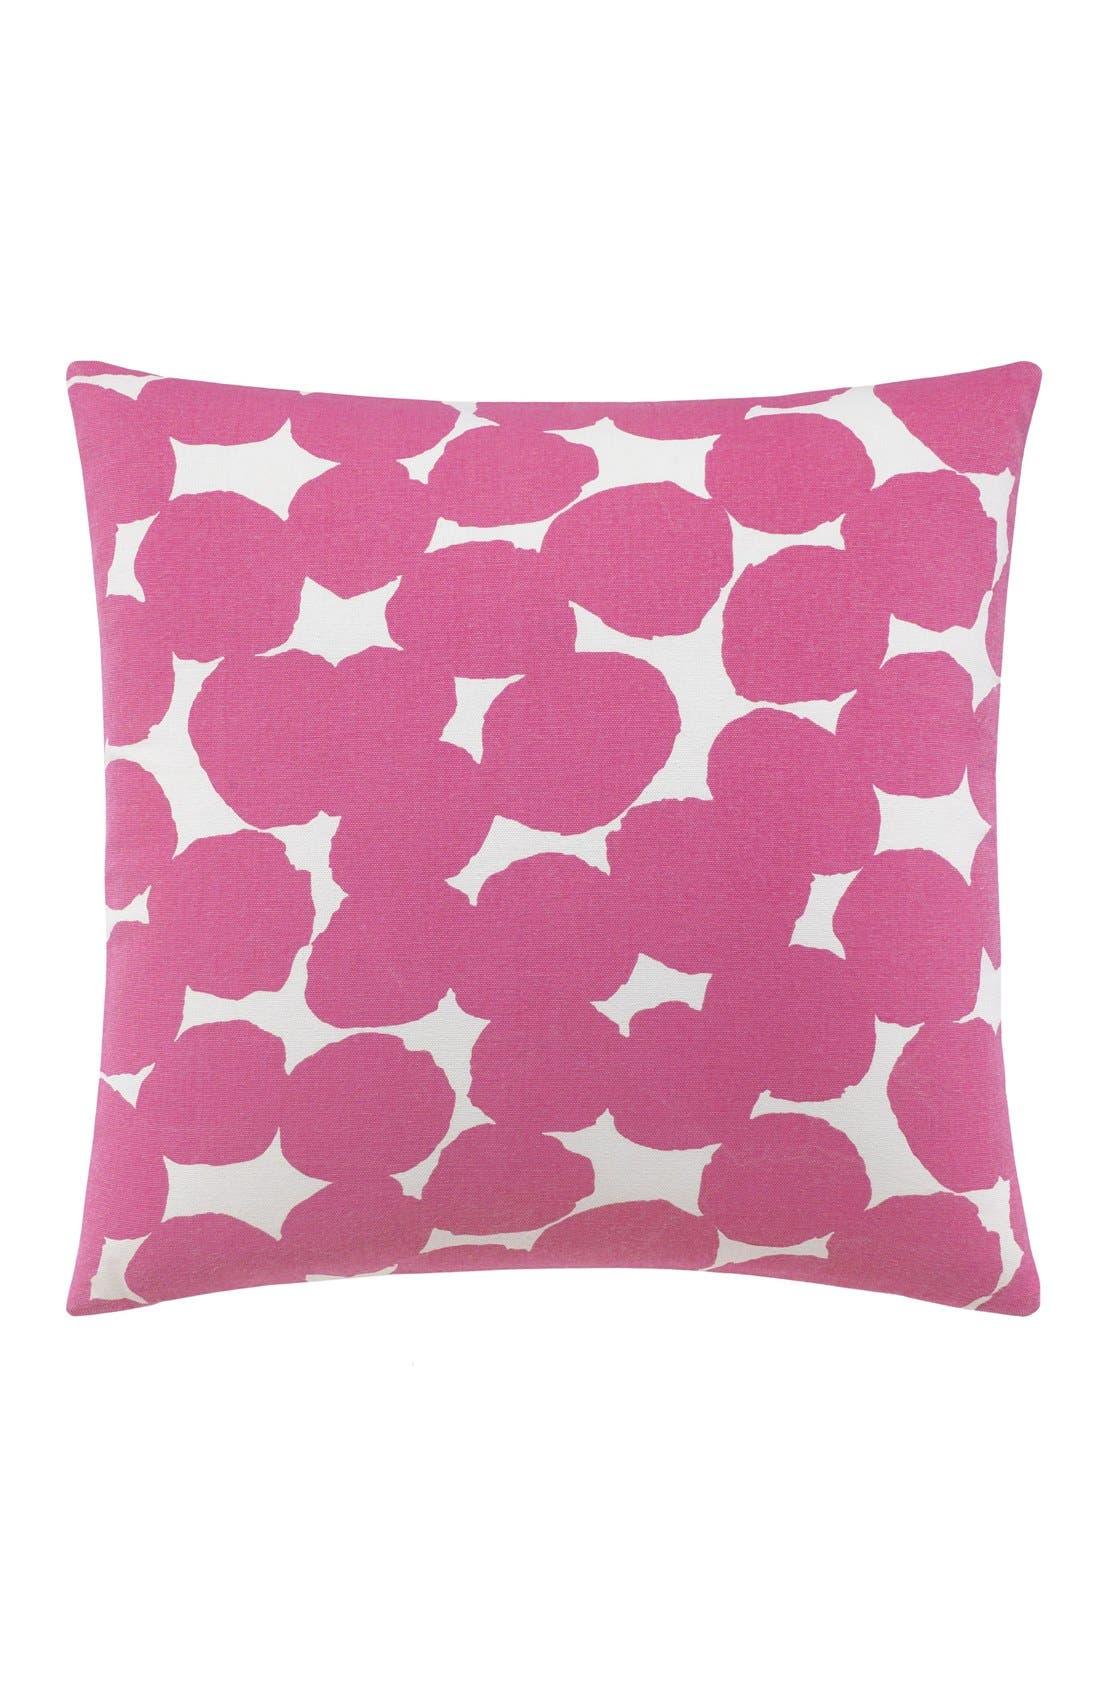 Main Image - kate spade new york 'random dot' accent pillow